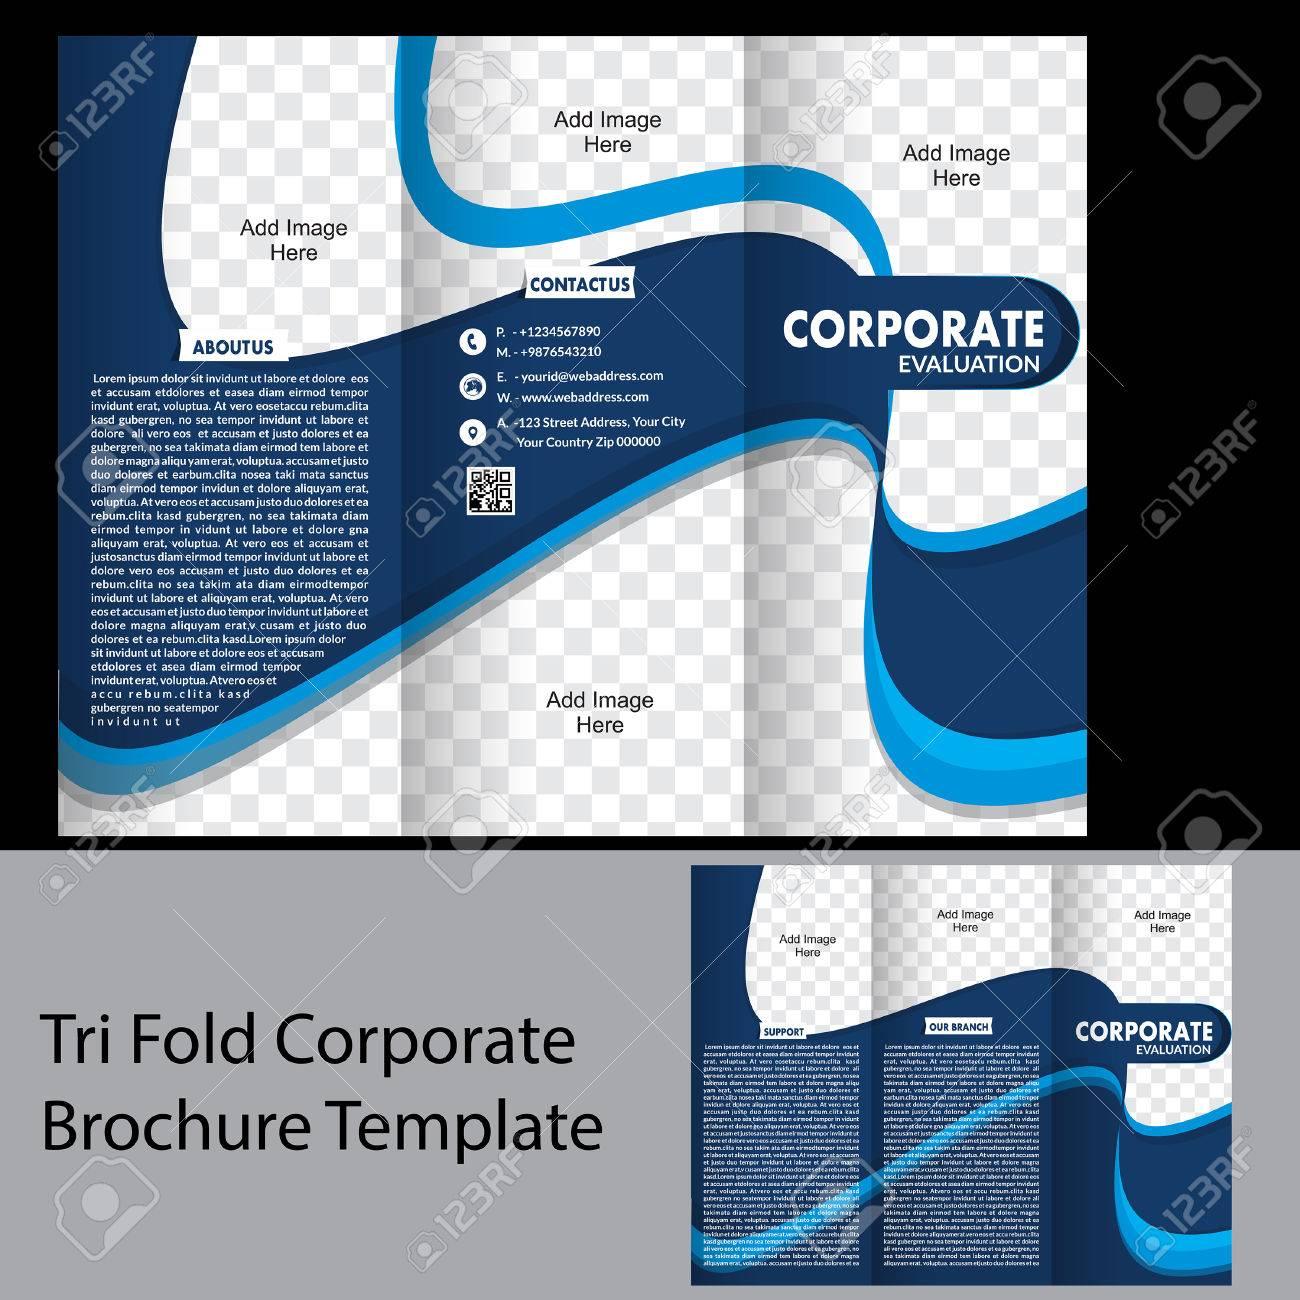 Tri Fold Corporate Brochure Template Vetor Illutsration Royalty Free ...